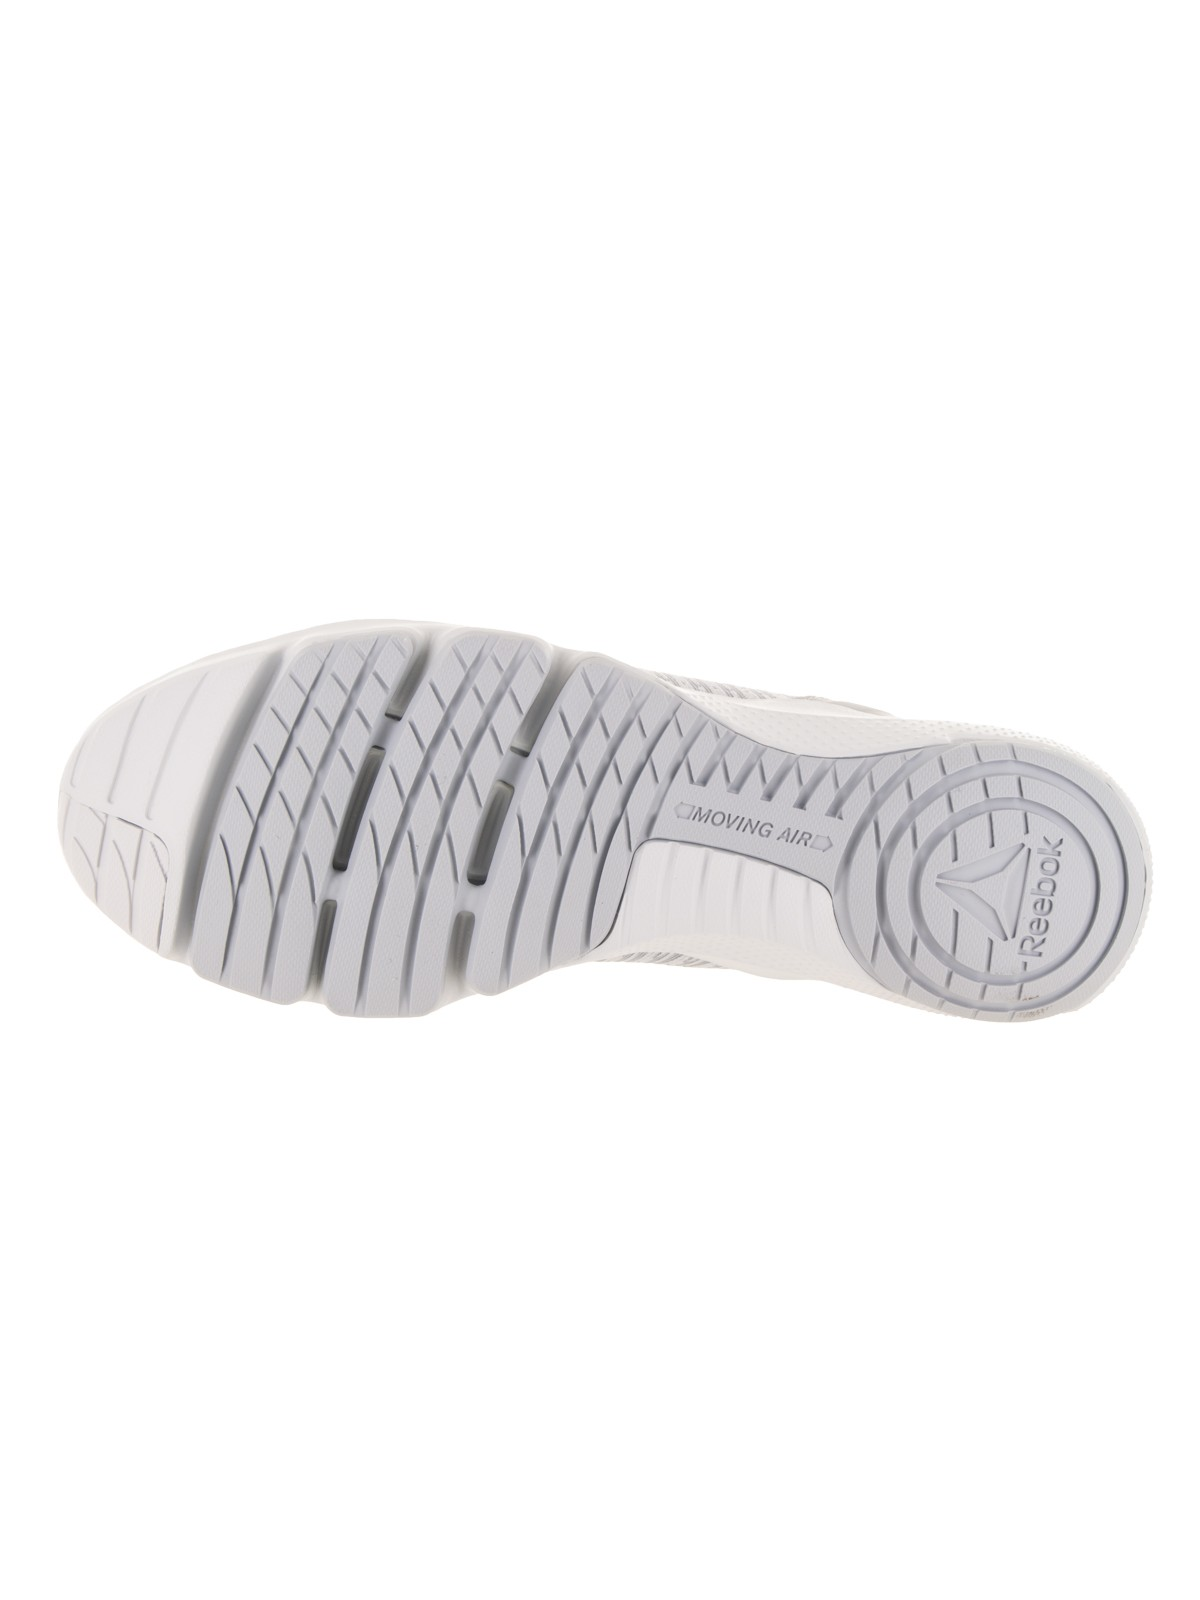 ae2029bb72a878 Reebok Women s Cloudride DMX 3.0 Training Shoe